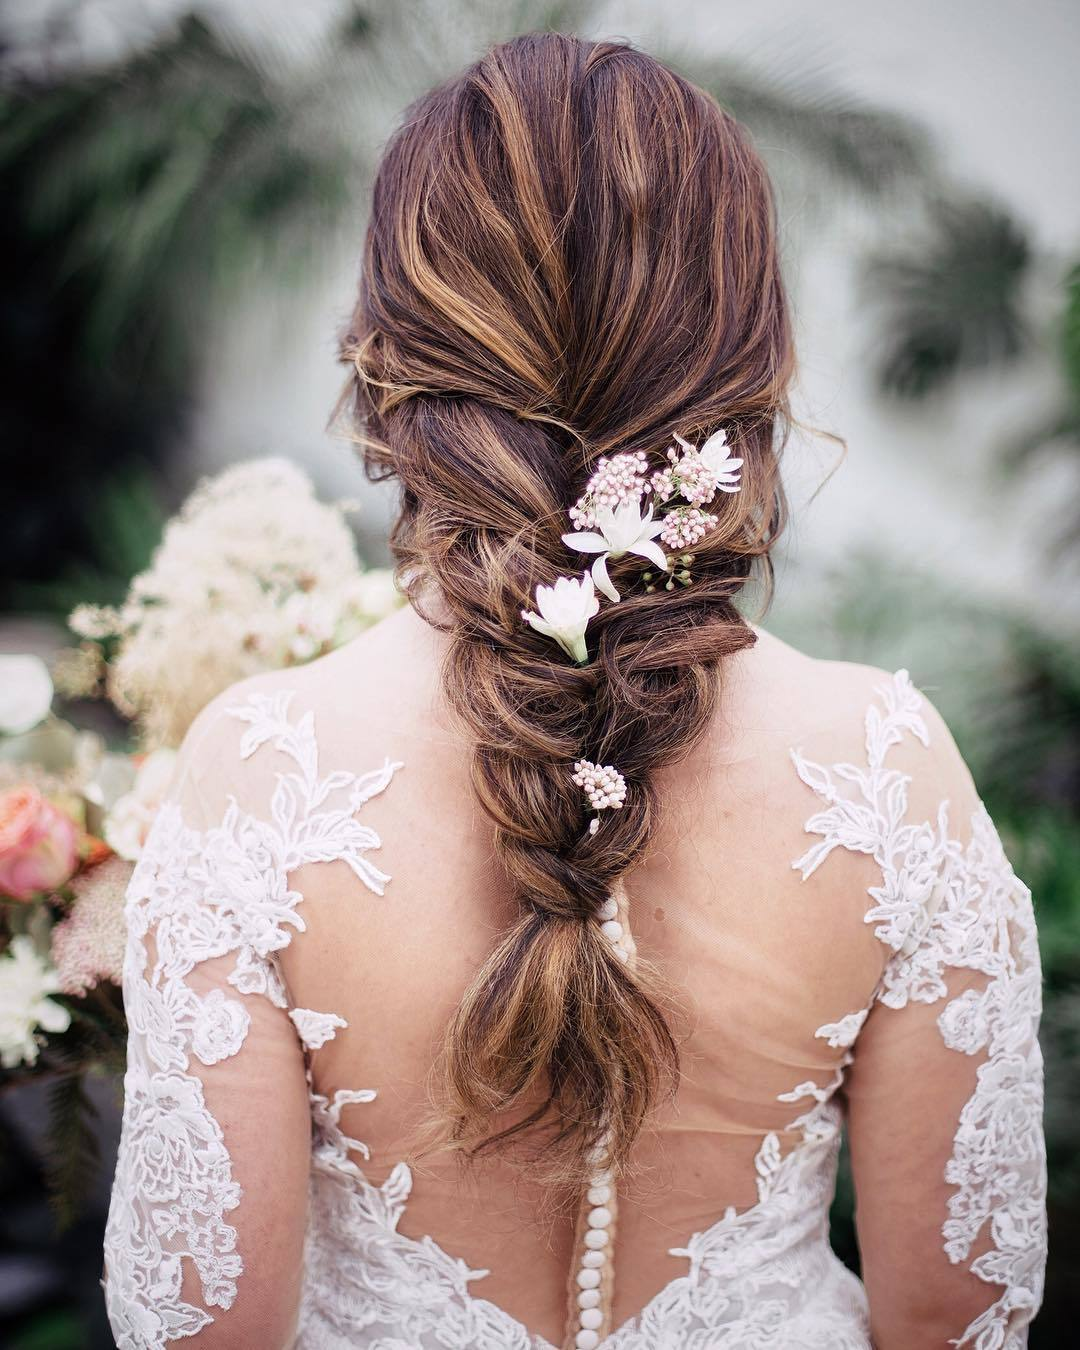 47 Stunning Wedding Hairstyles All Brides Will Love In